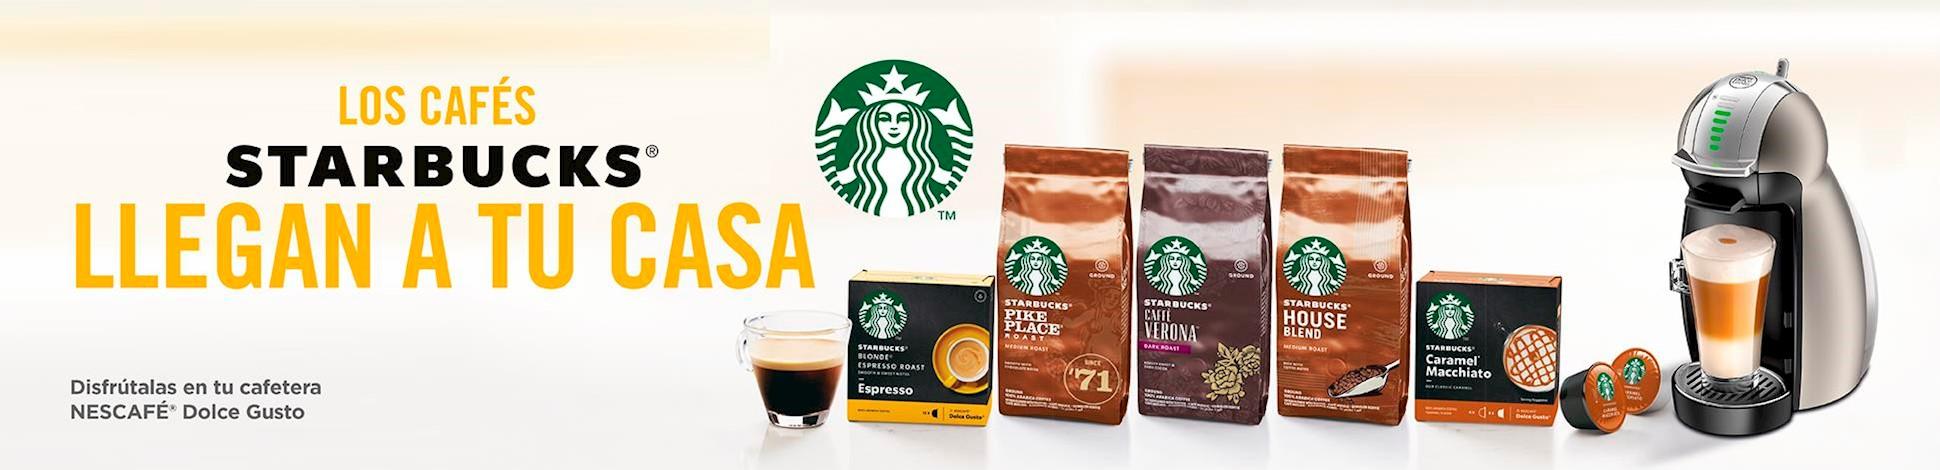 NDG_Starbucks_DigitalMAY20-02.png | Juntoz.com